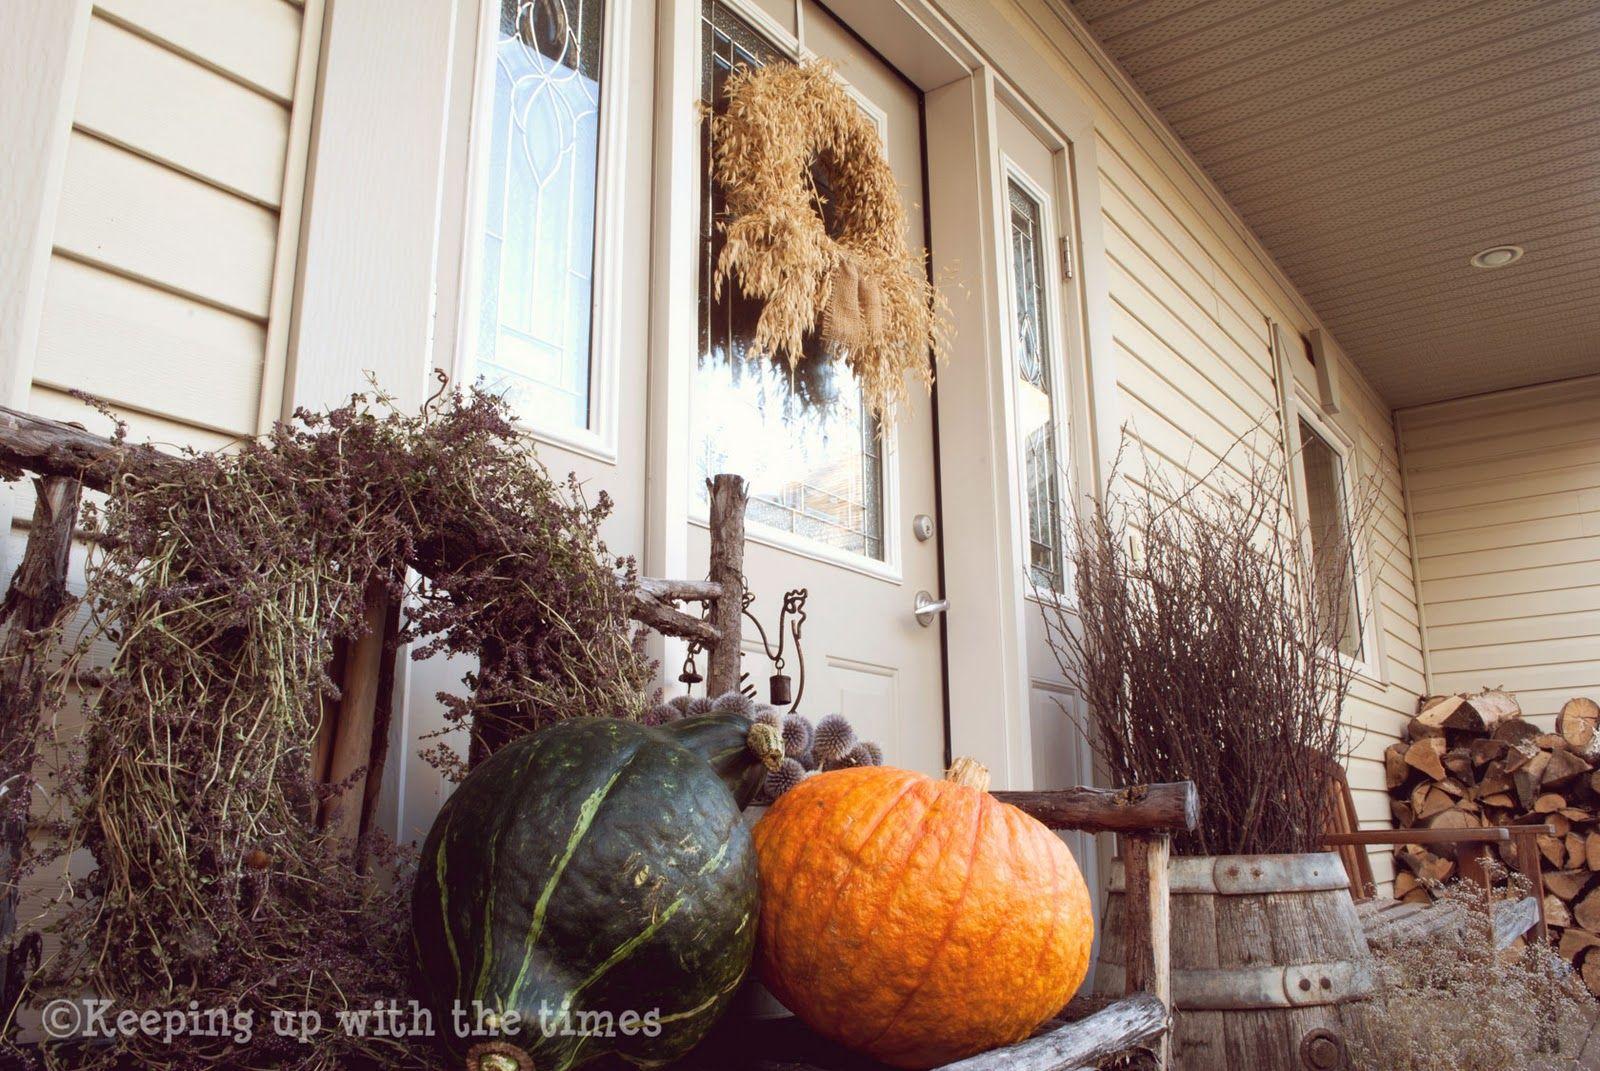 Rustic Fall Porch Beautiful Home Seasonal Porch Ideas